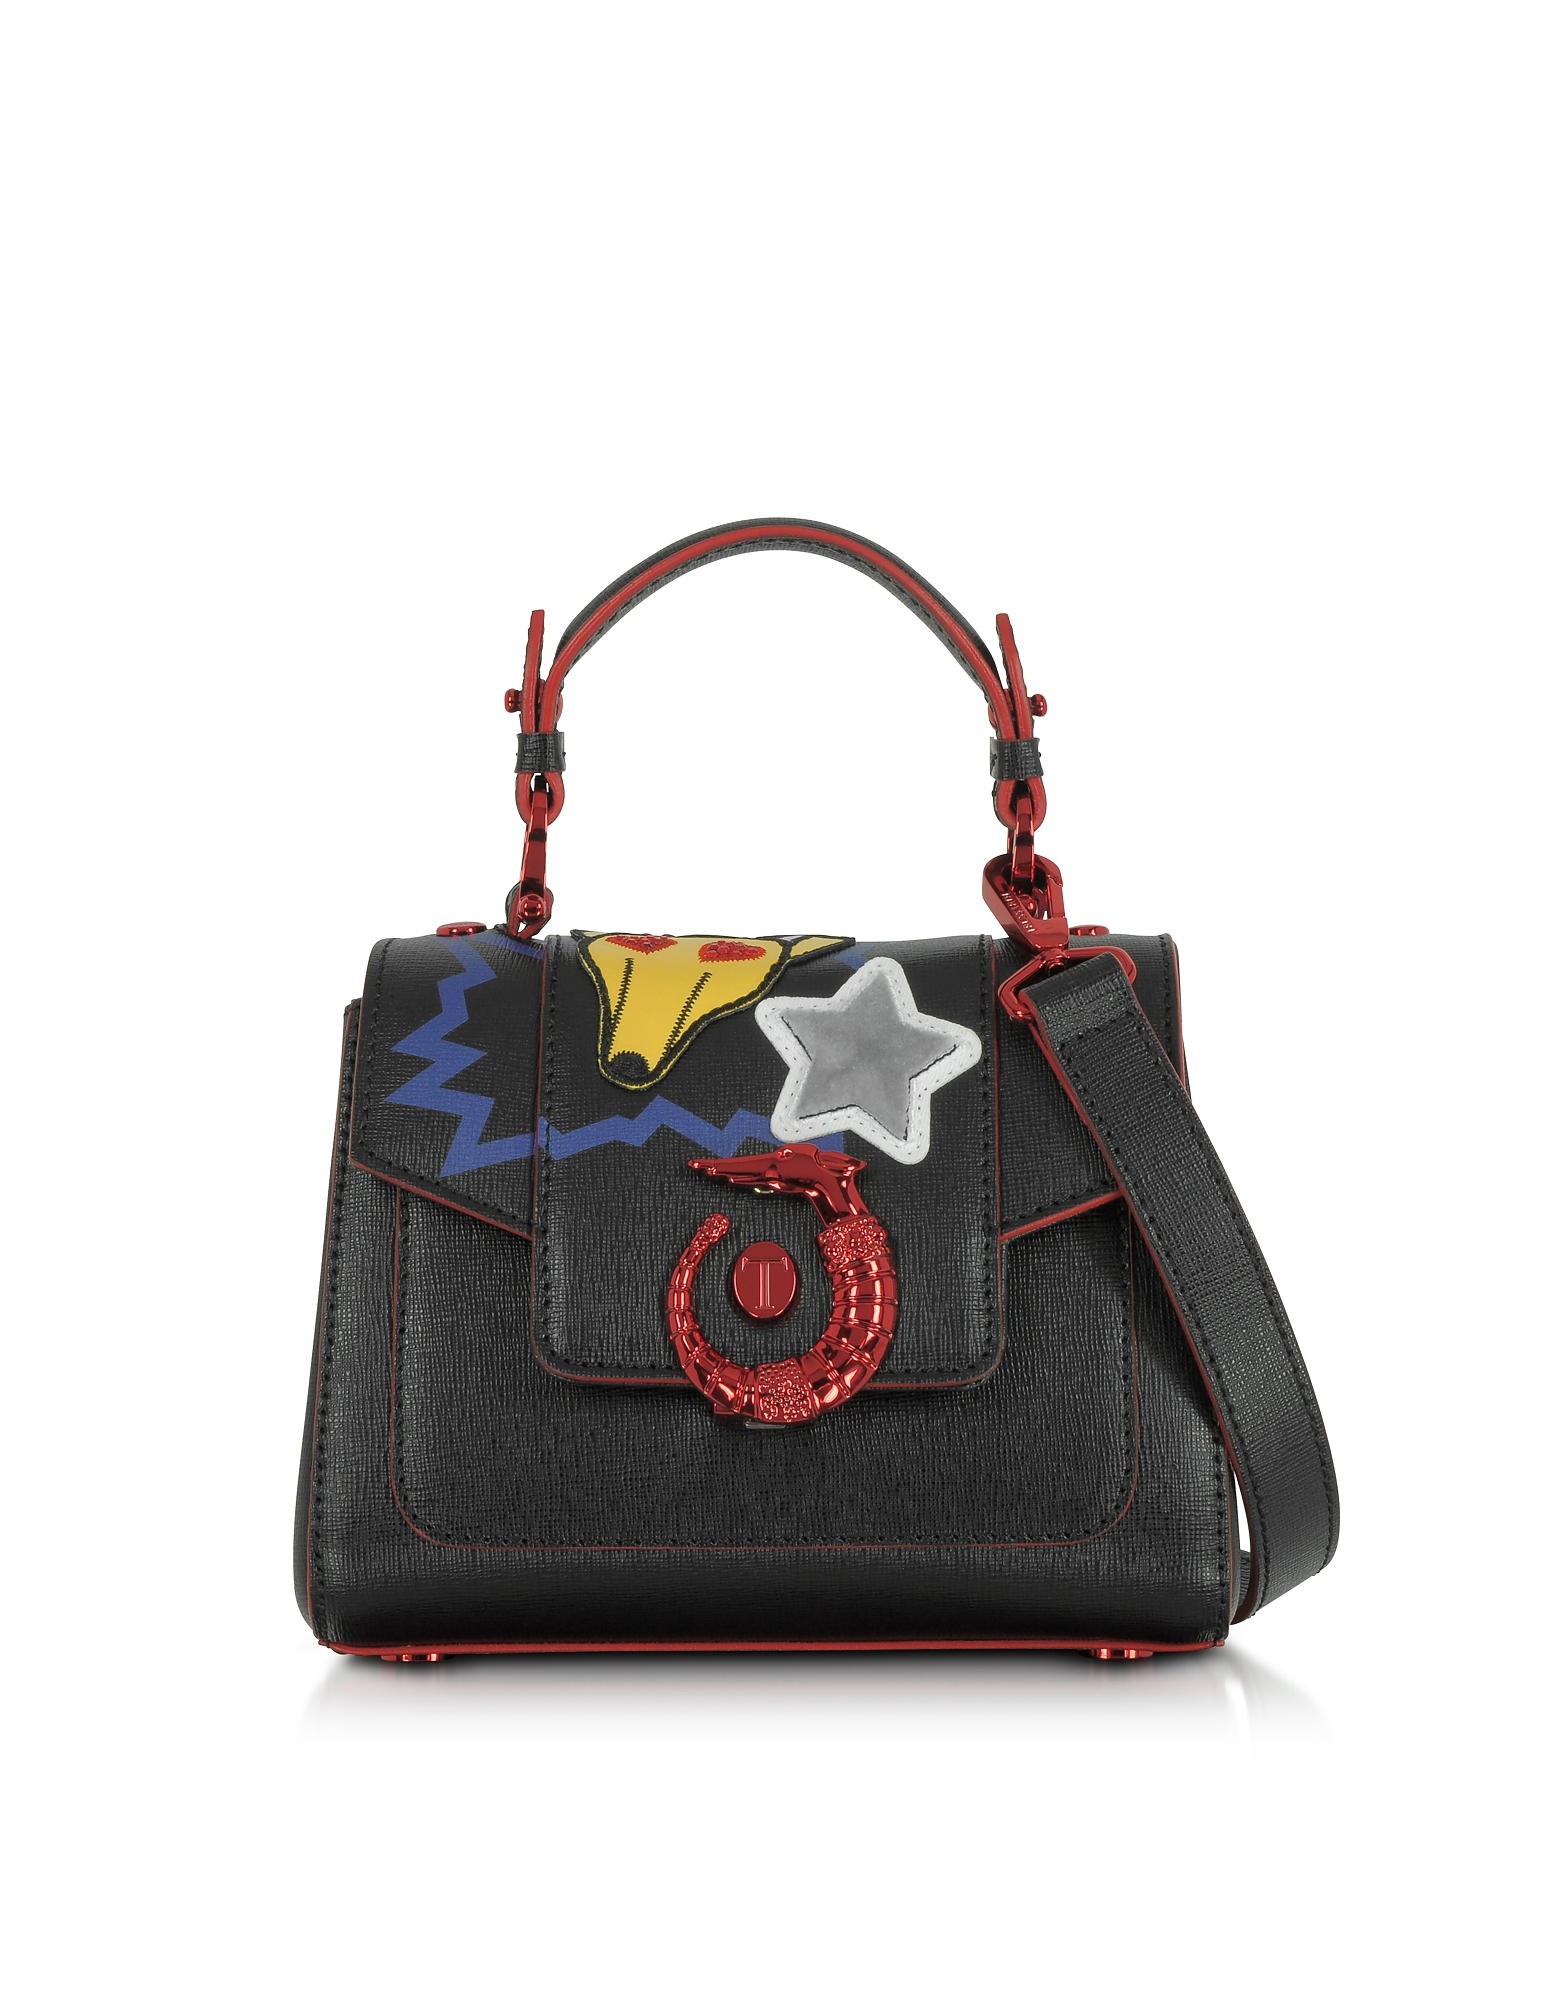 Trussardi Handbags, Lovy Black Saffiano Leather Mini Crossbody Bag w/Emoticon Embroidery